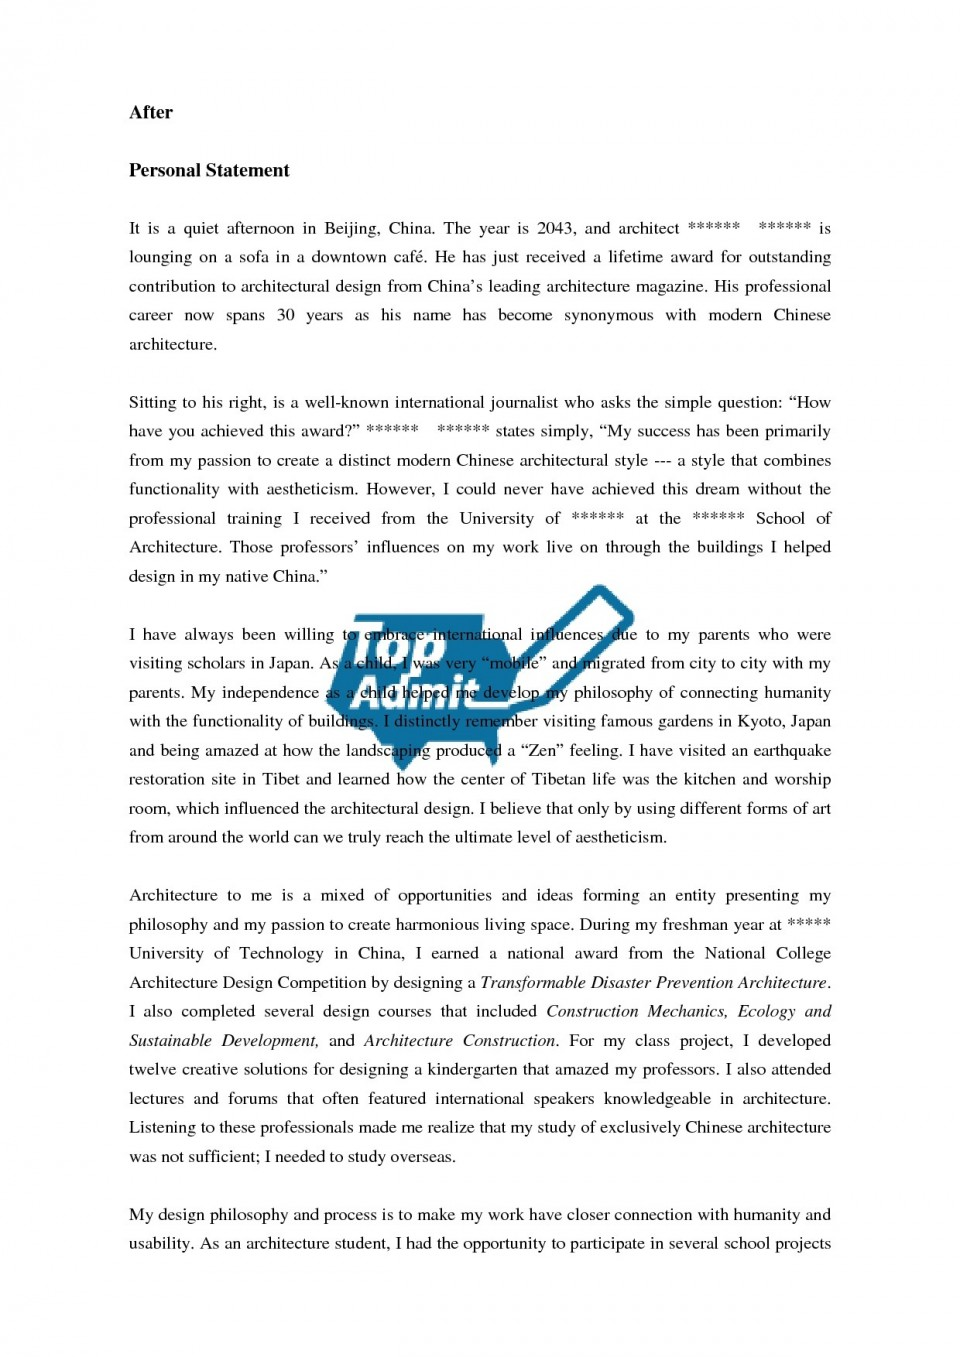 002 Zwjgmmd Stanford Application Essay Wonderful Admissions Questions Prompts Help 960